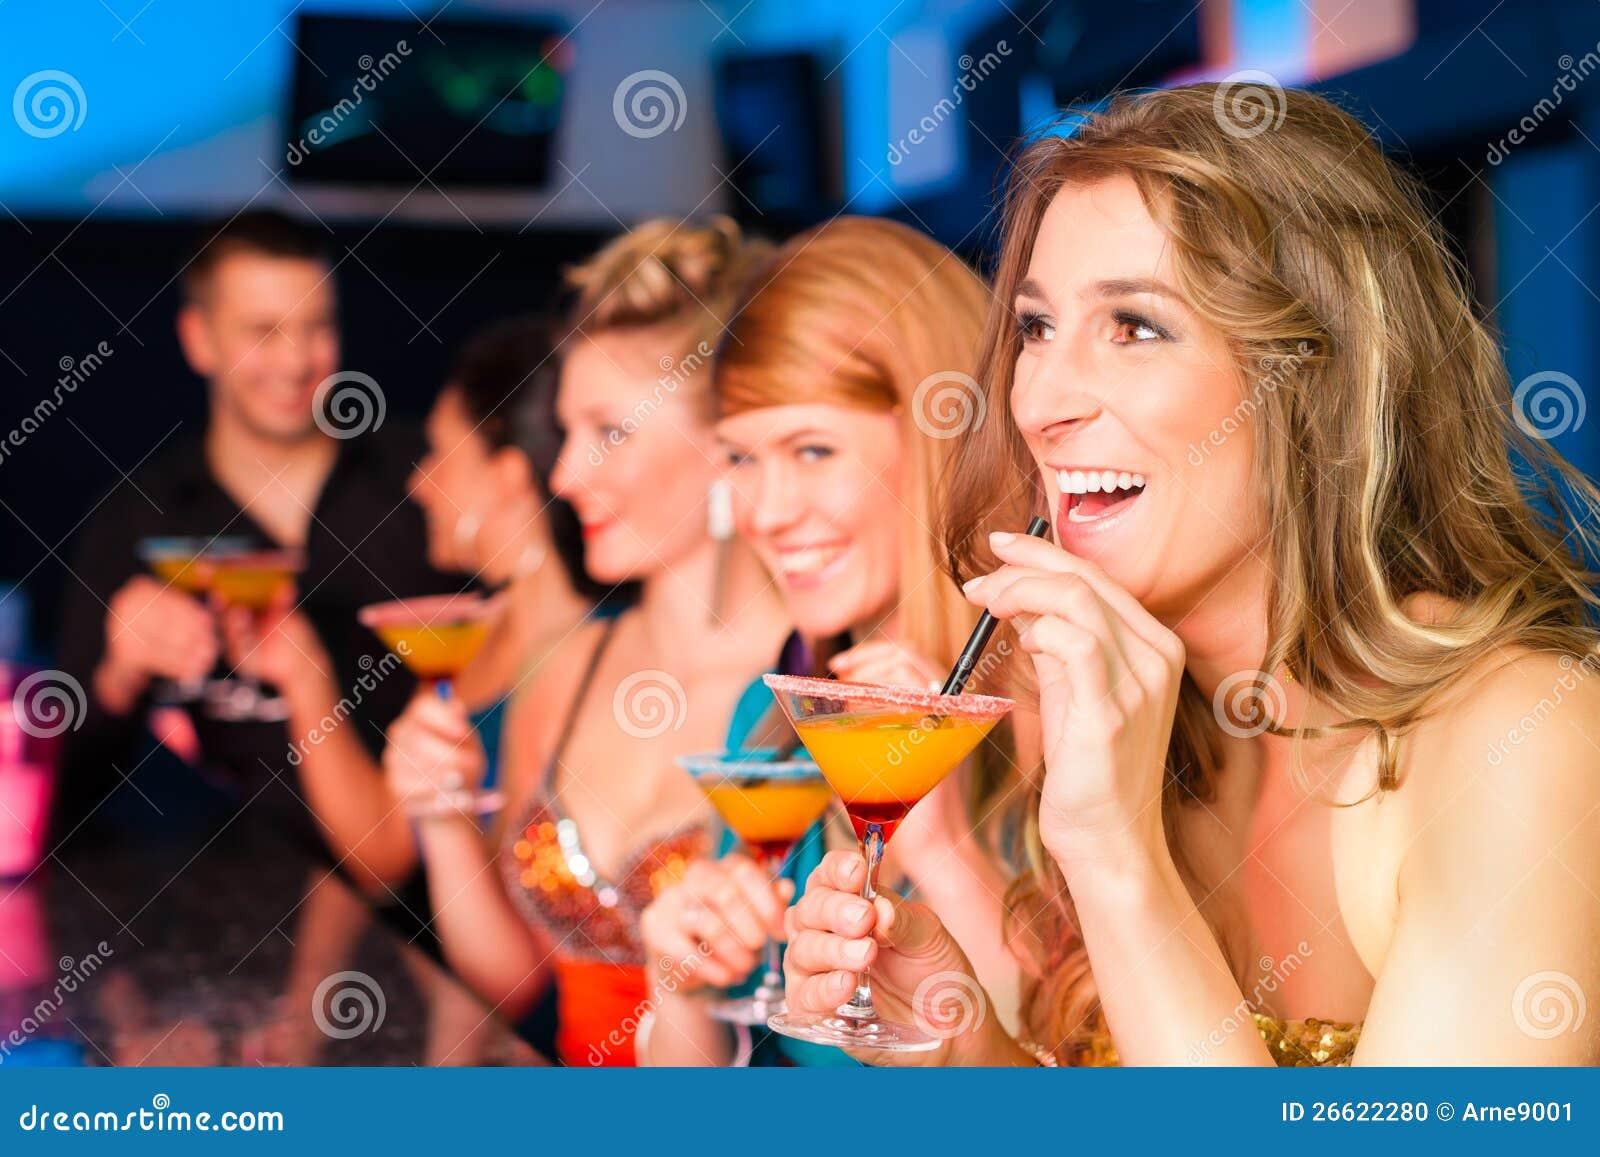 Снял в баре онлайн 11 фотография